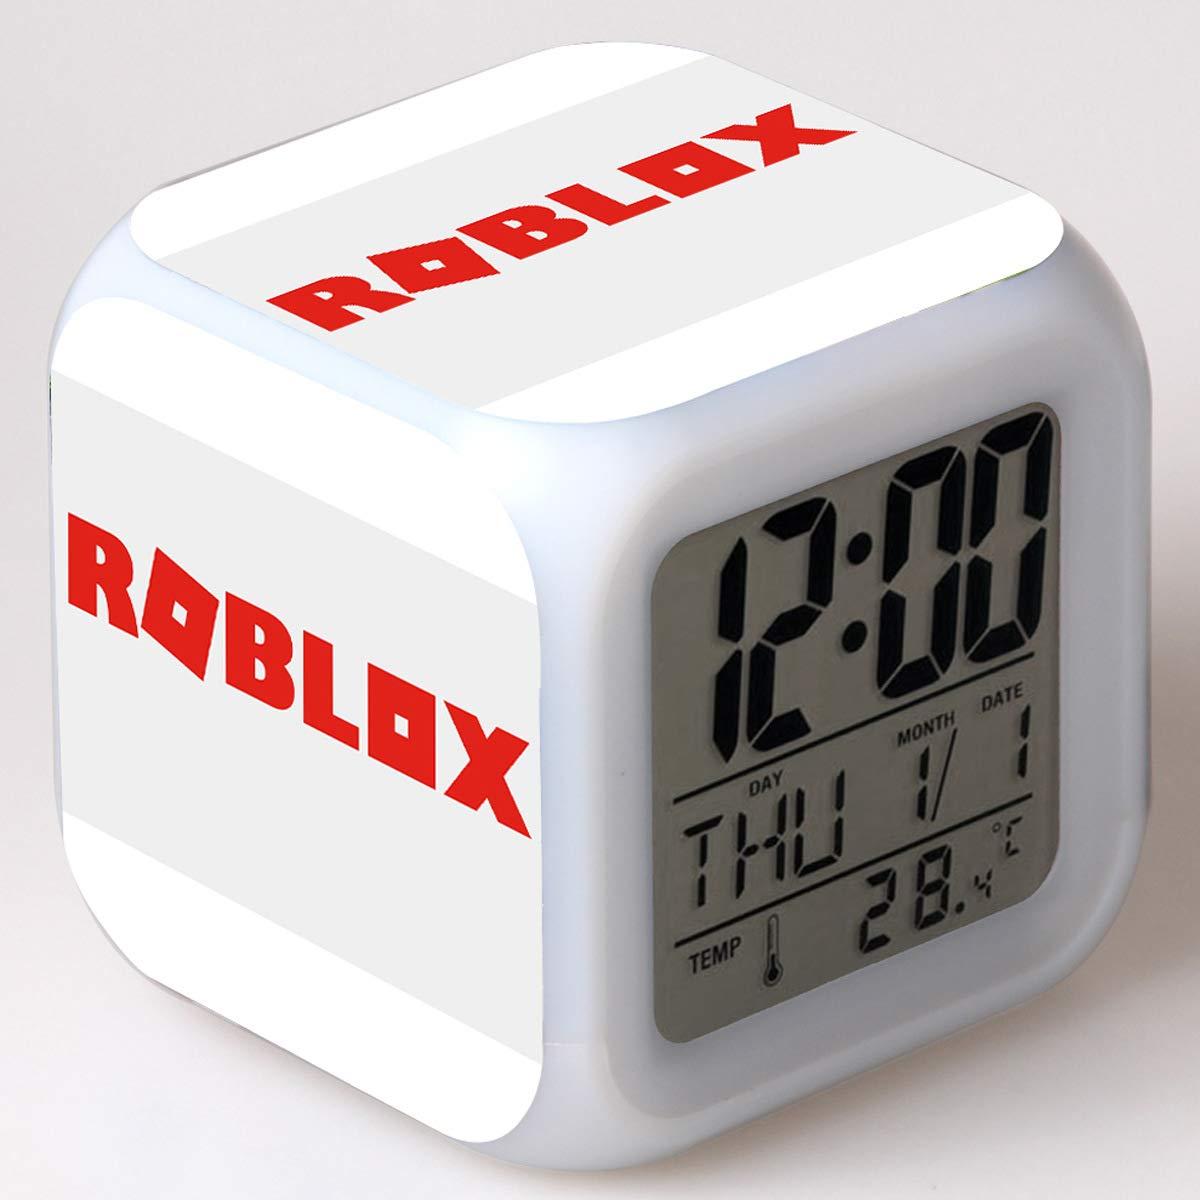 MD@Alarm clock Reloj Despertador Digital, Contains Roblox Theme Reloj Dibujos Animados Reloj Pantalla Temperatura Despertador,004